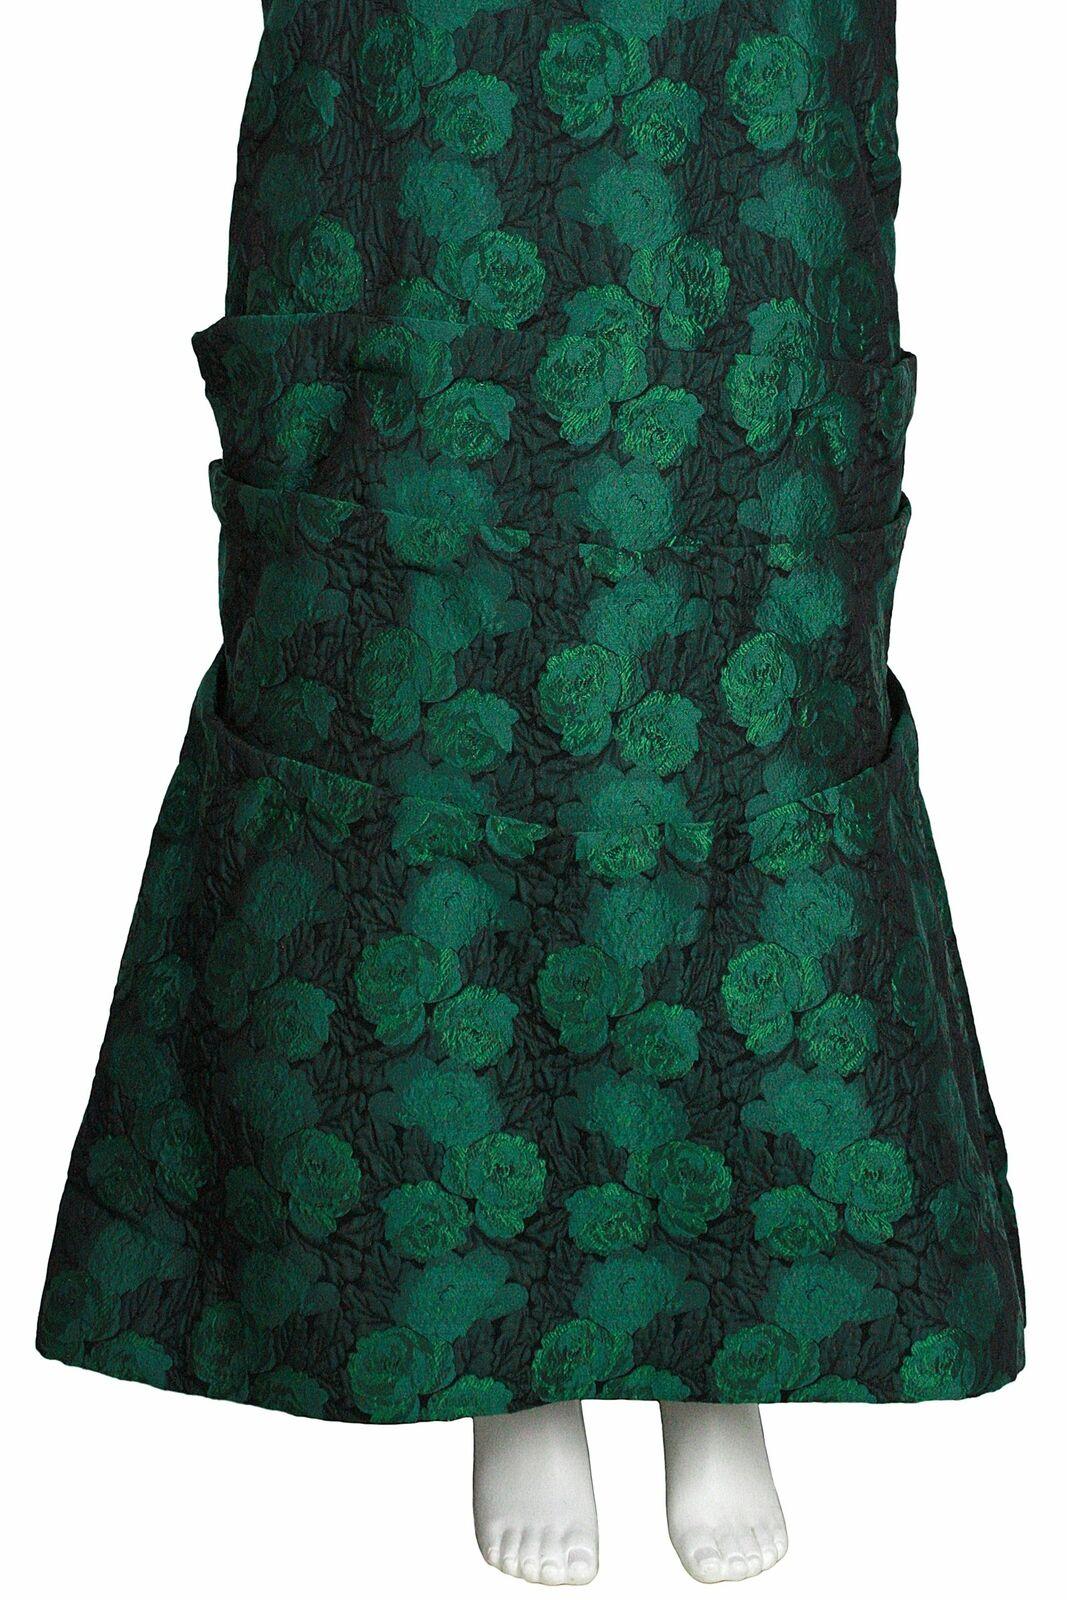 ARNOLD SCAASI 1980s Dark Green Floral Brocade Gow… - image 8